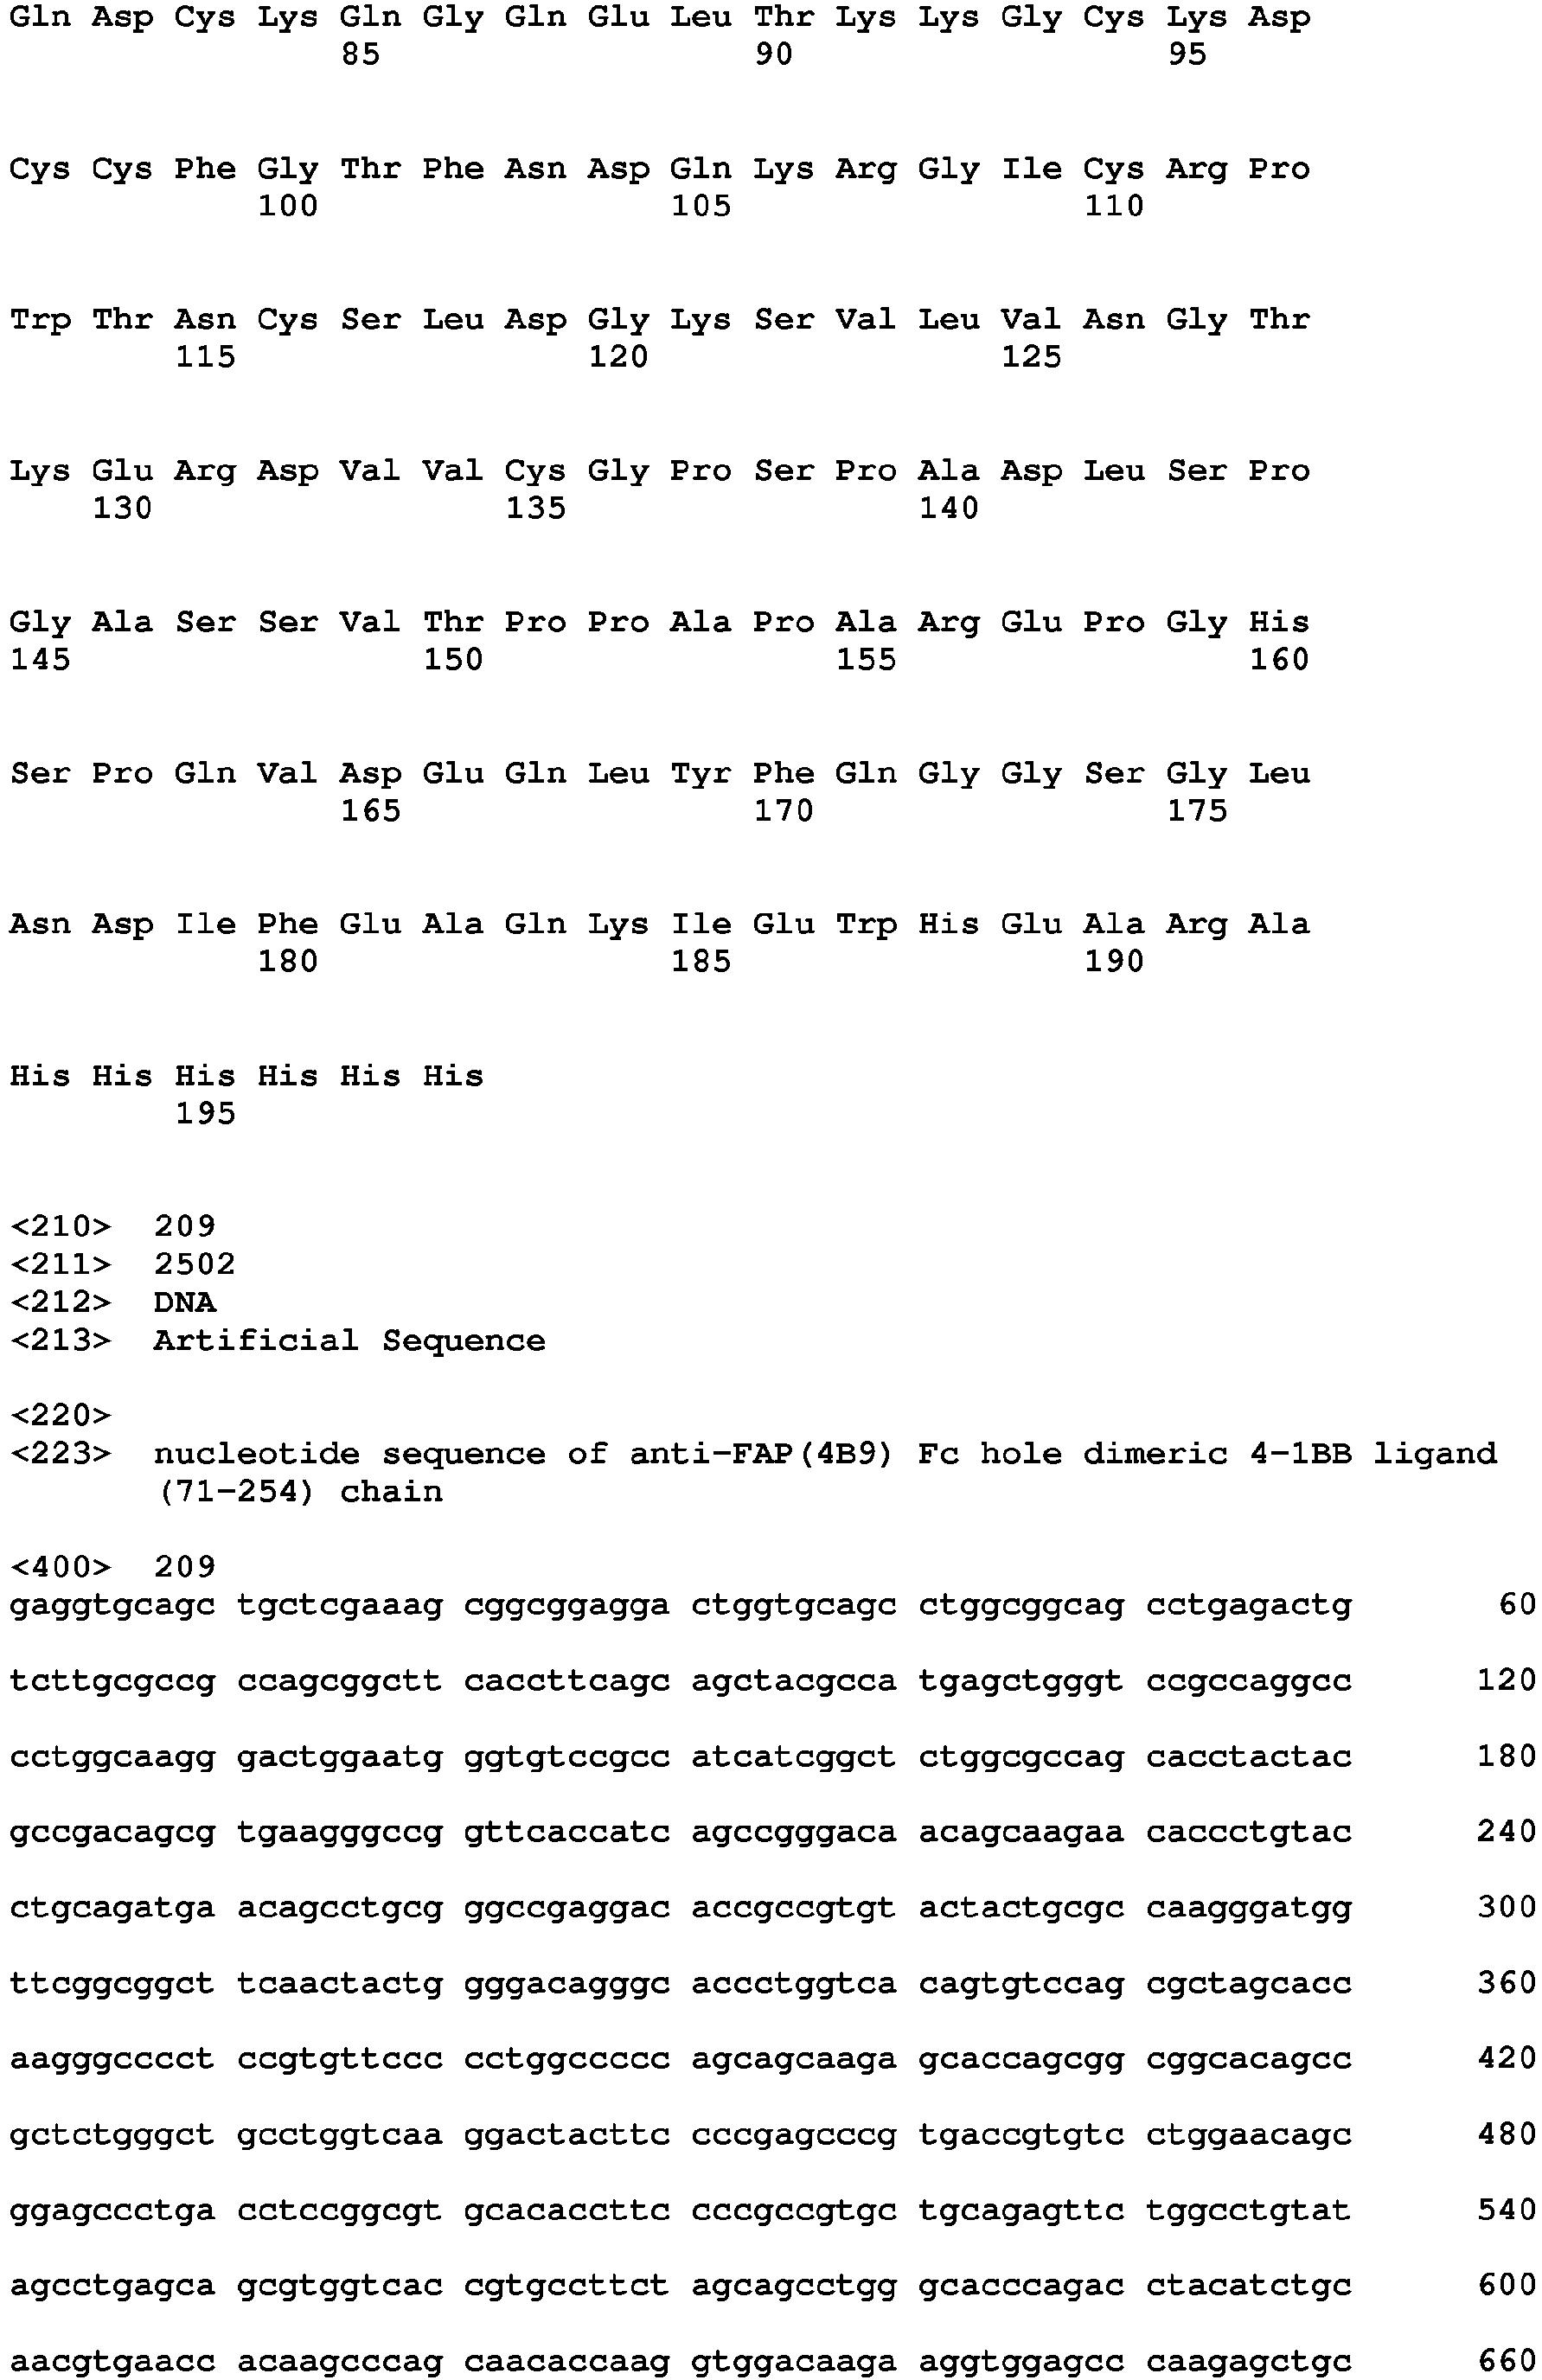 Figure imgb0510